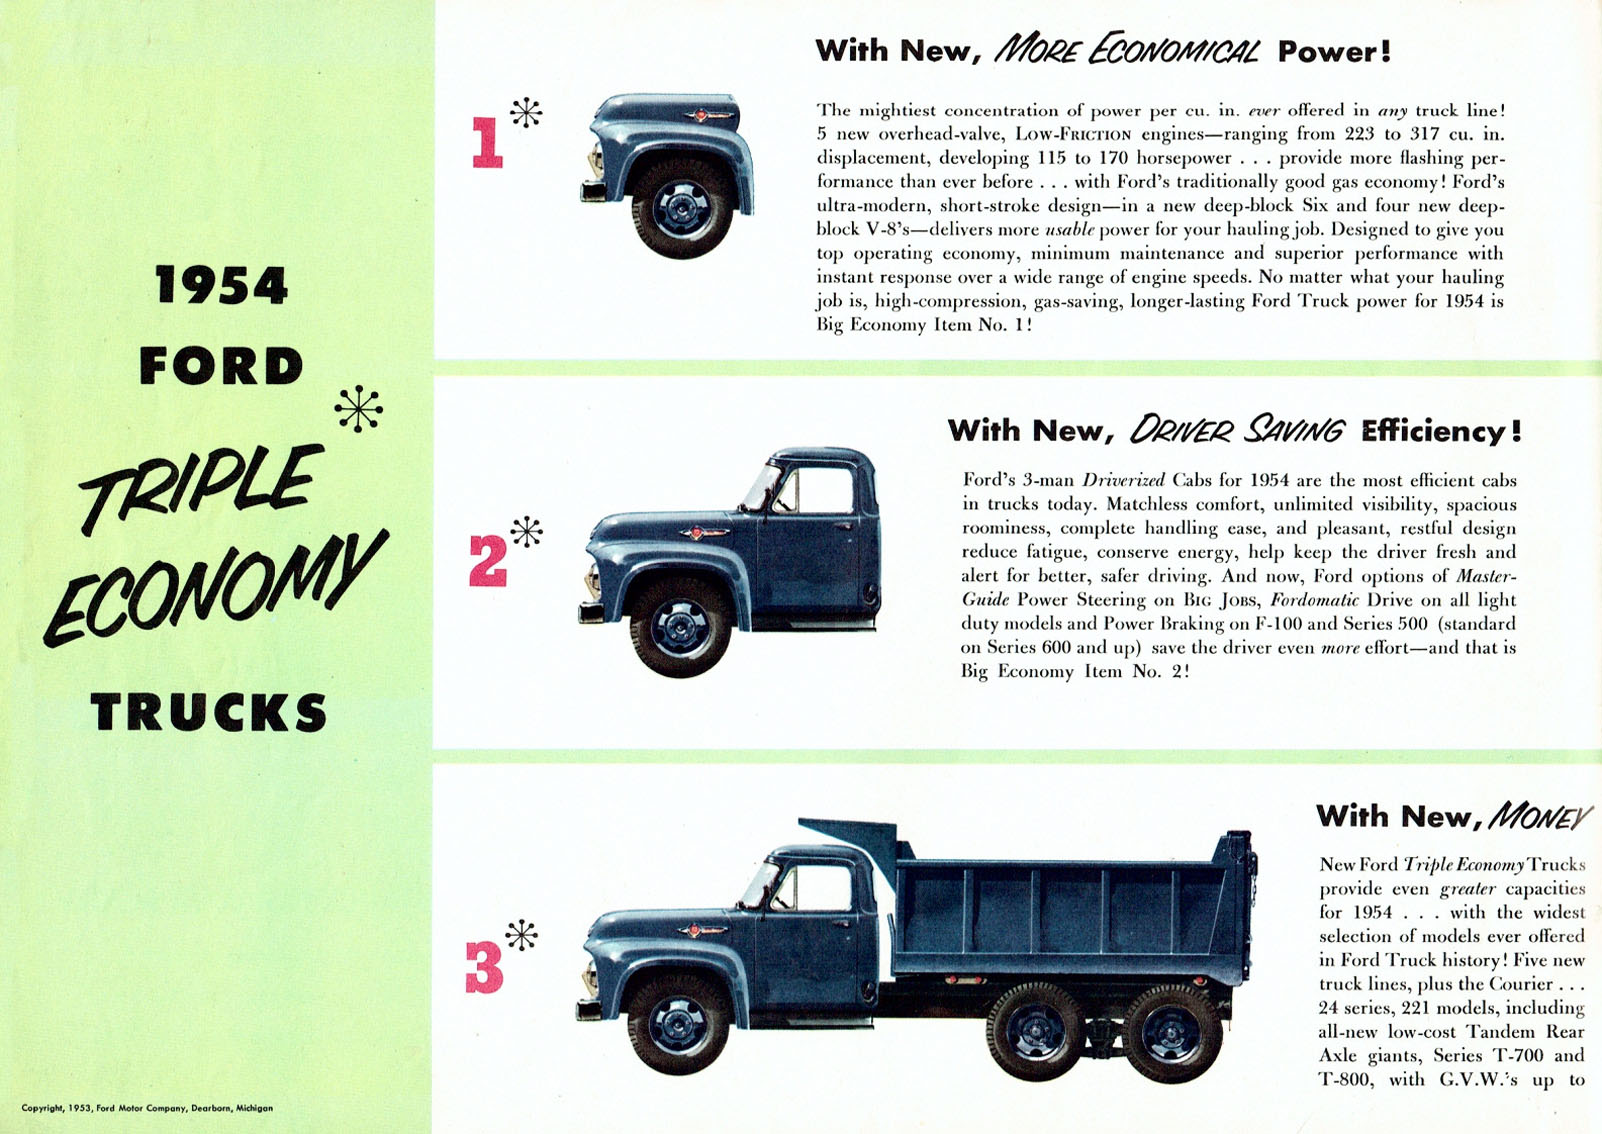 1954 Ford Truck Clip Art A Contribution By Trevor Poulsen Tocmp